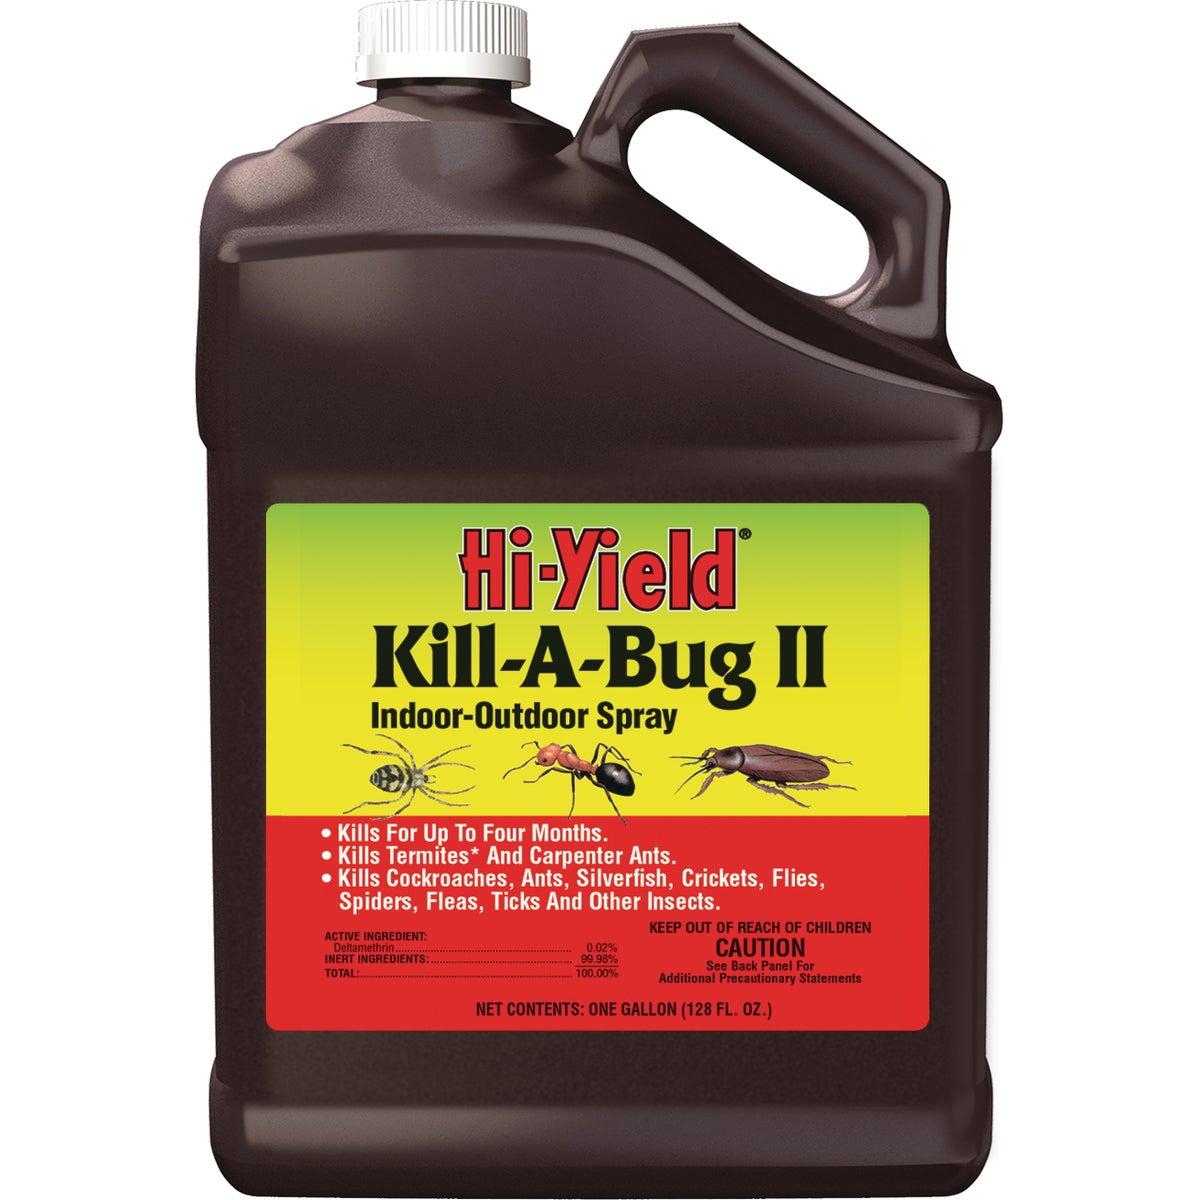 1G RTU KILL-A-BUG SPRAY